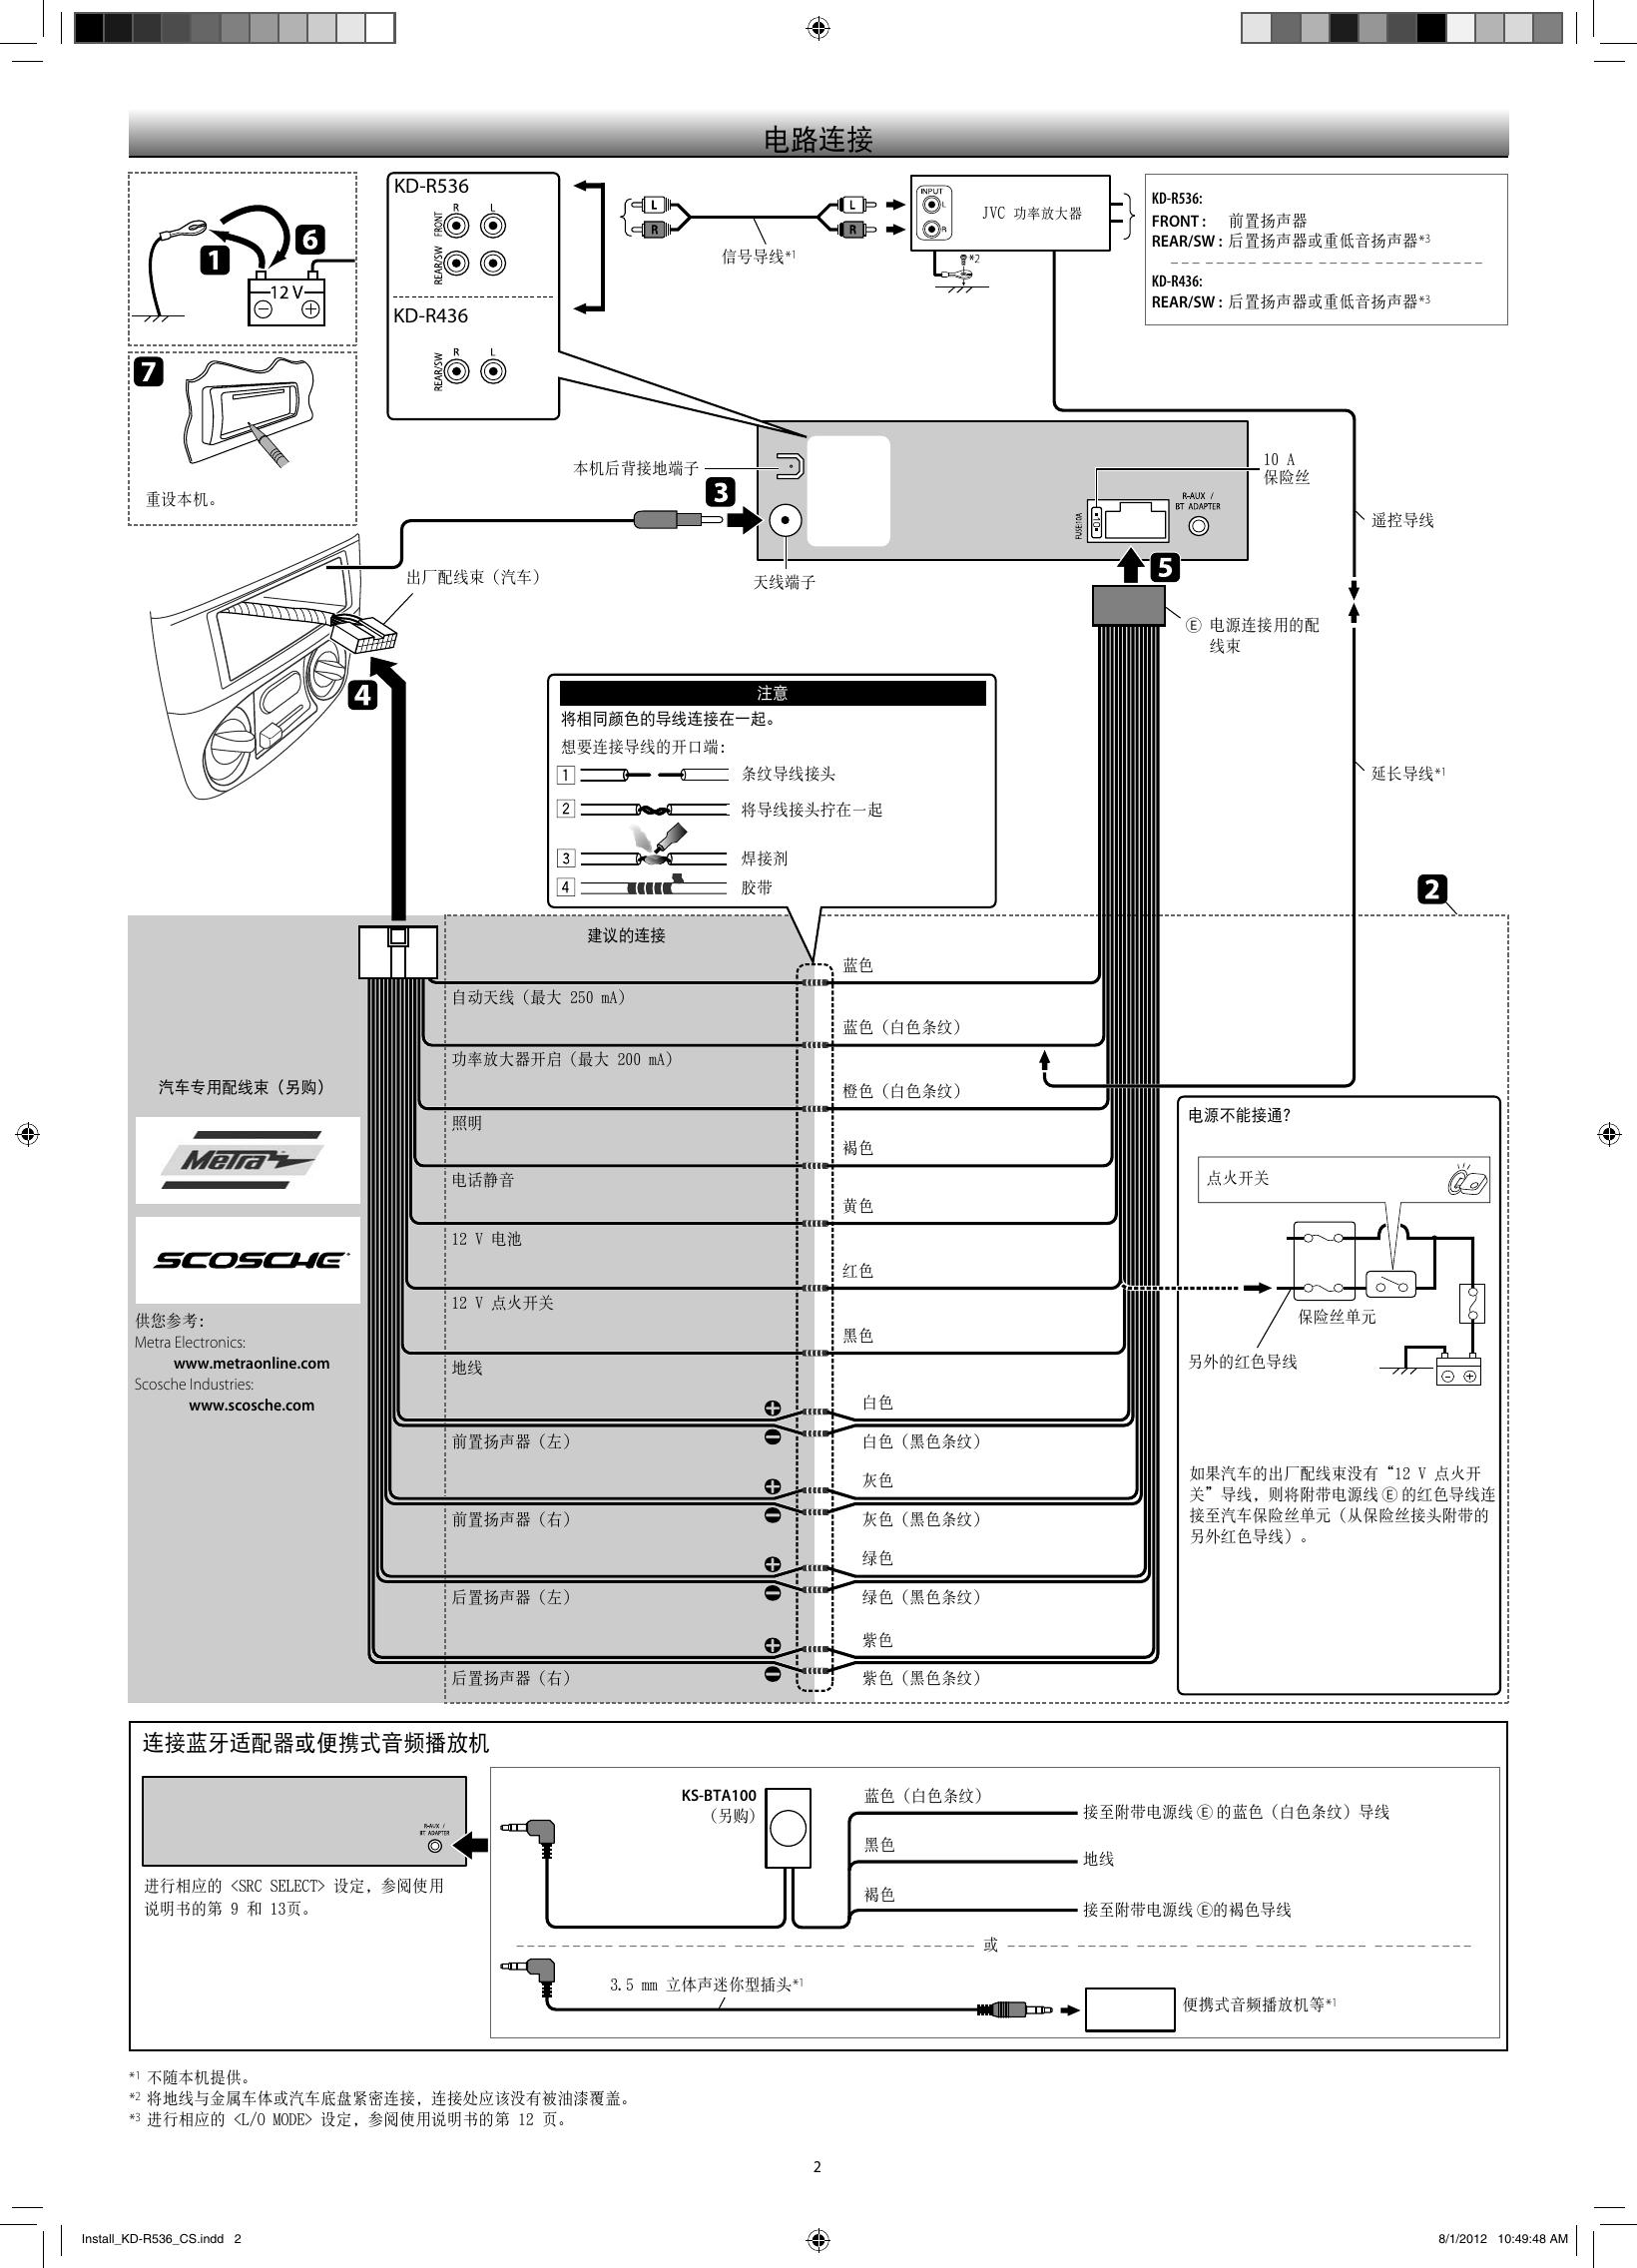 Jvc Kd R536 R536 Kd R436 User Manual Installation Get0770 010a